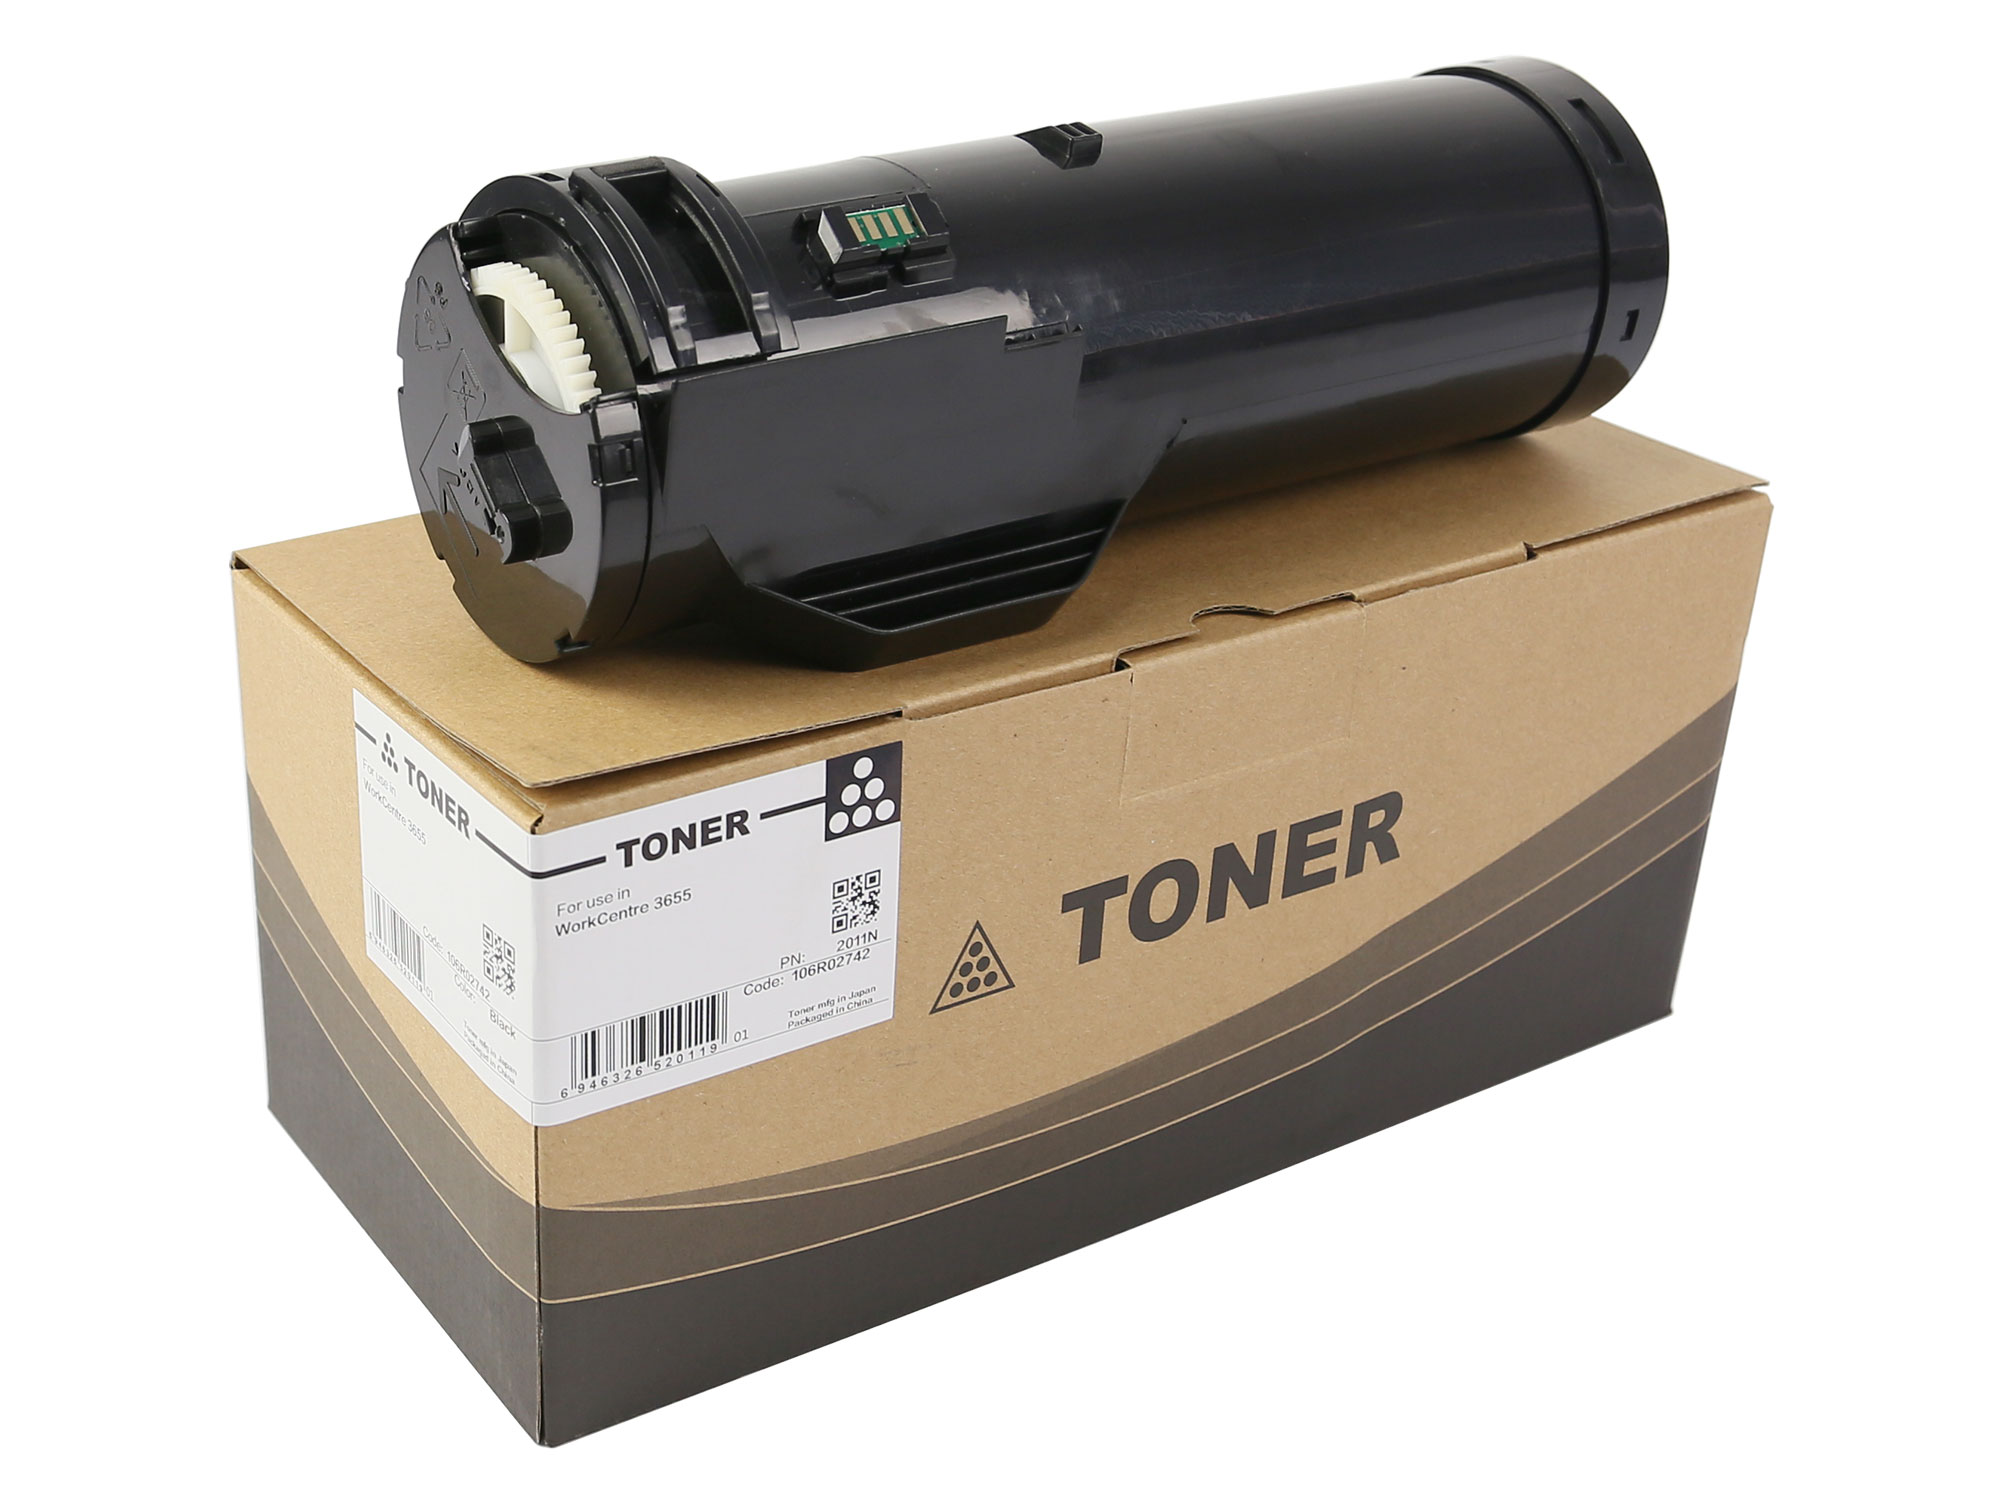 106R02742 Toner Cartridge Metered for Xerox WorkCentre 3655